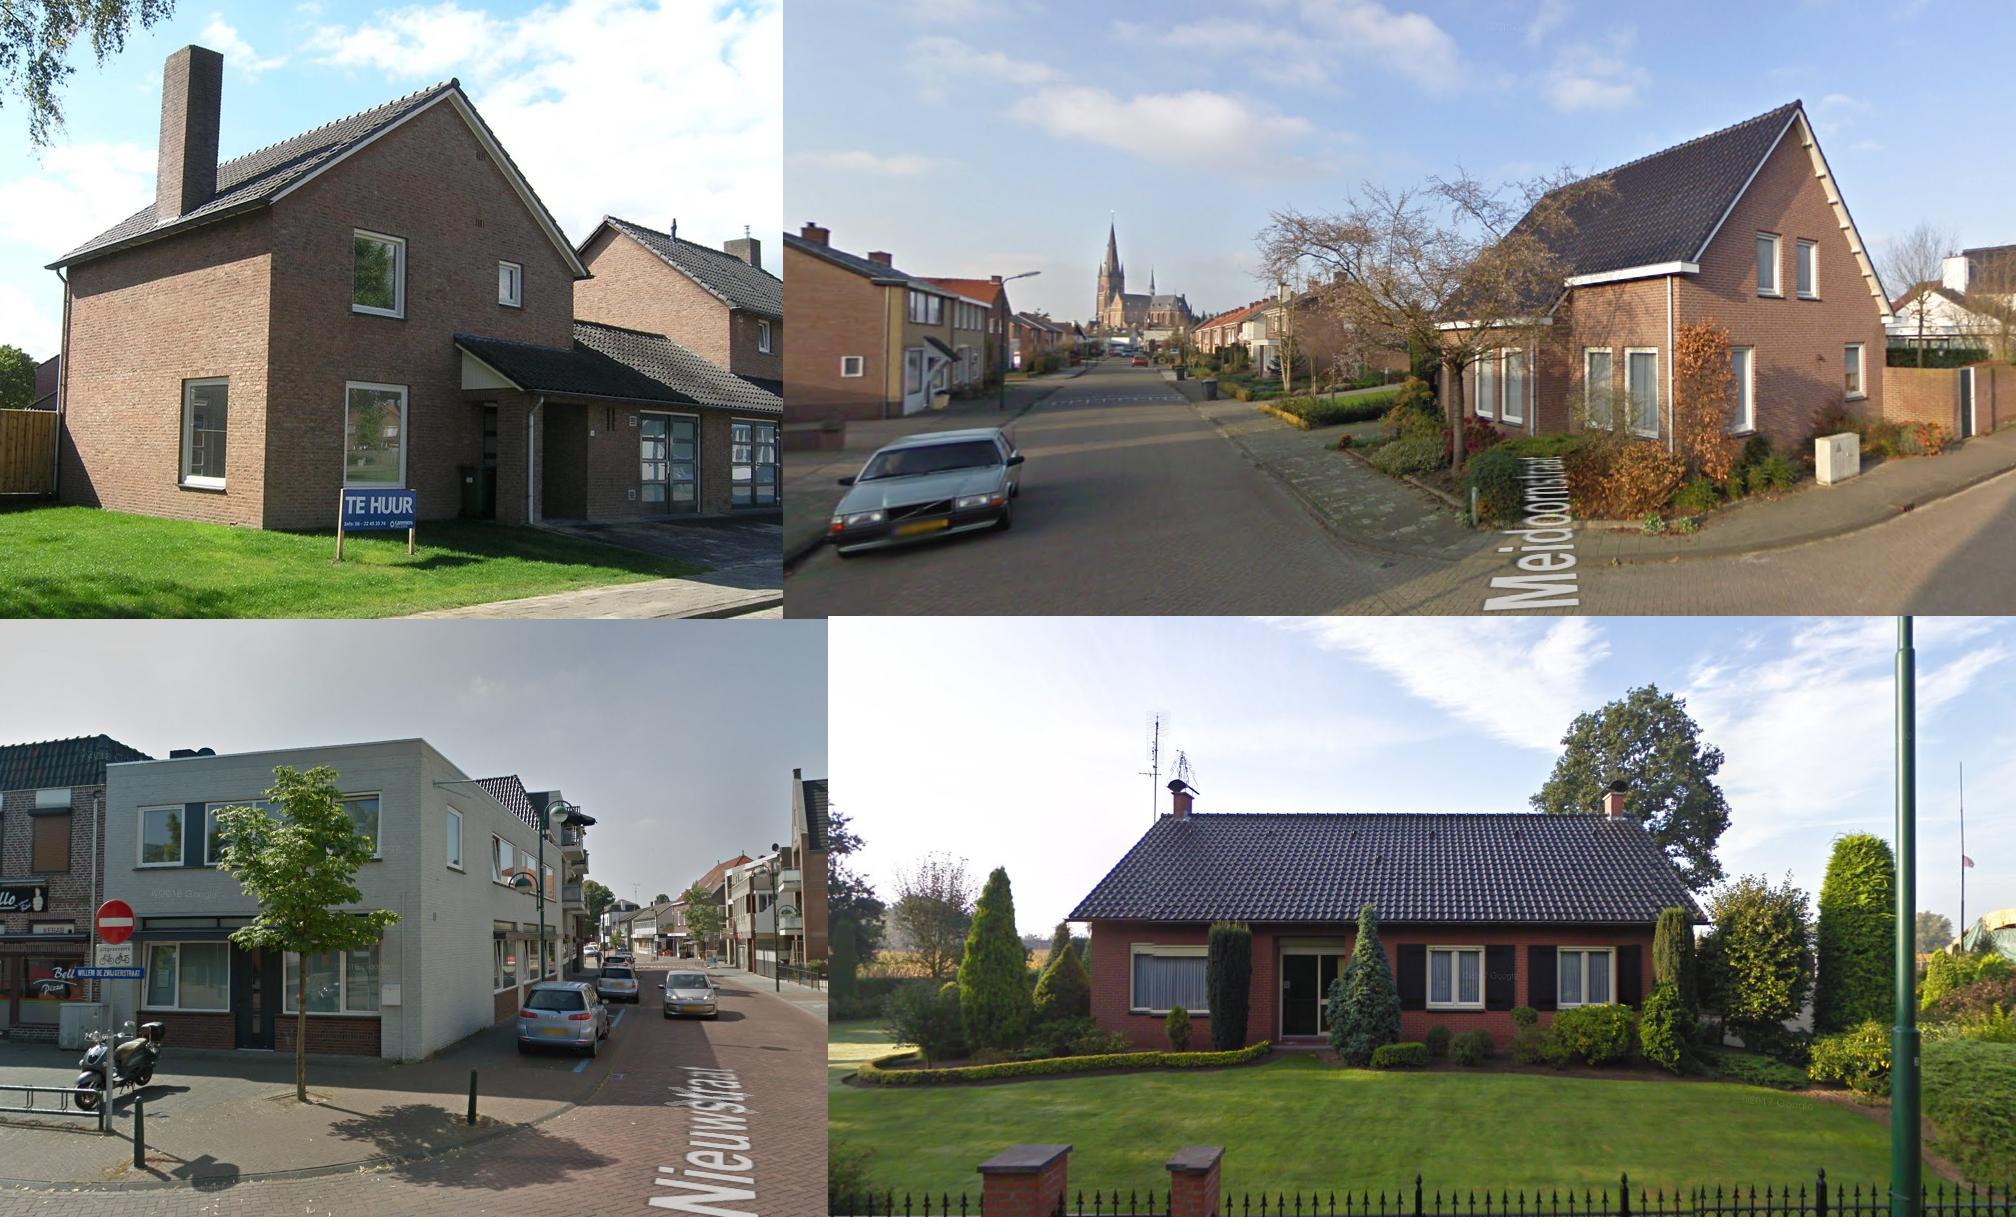 Greep uit diverse woningen Budel, Gastel en Maarheeze